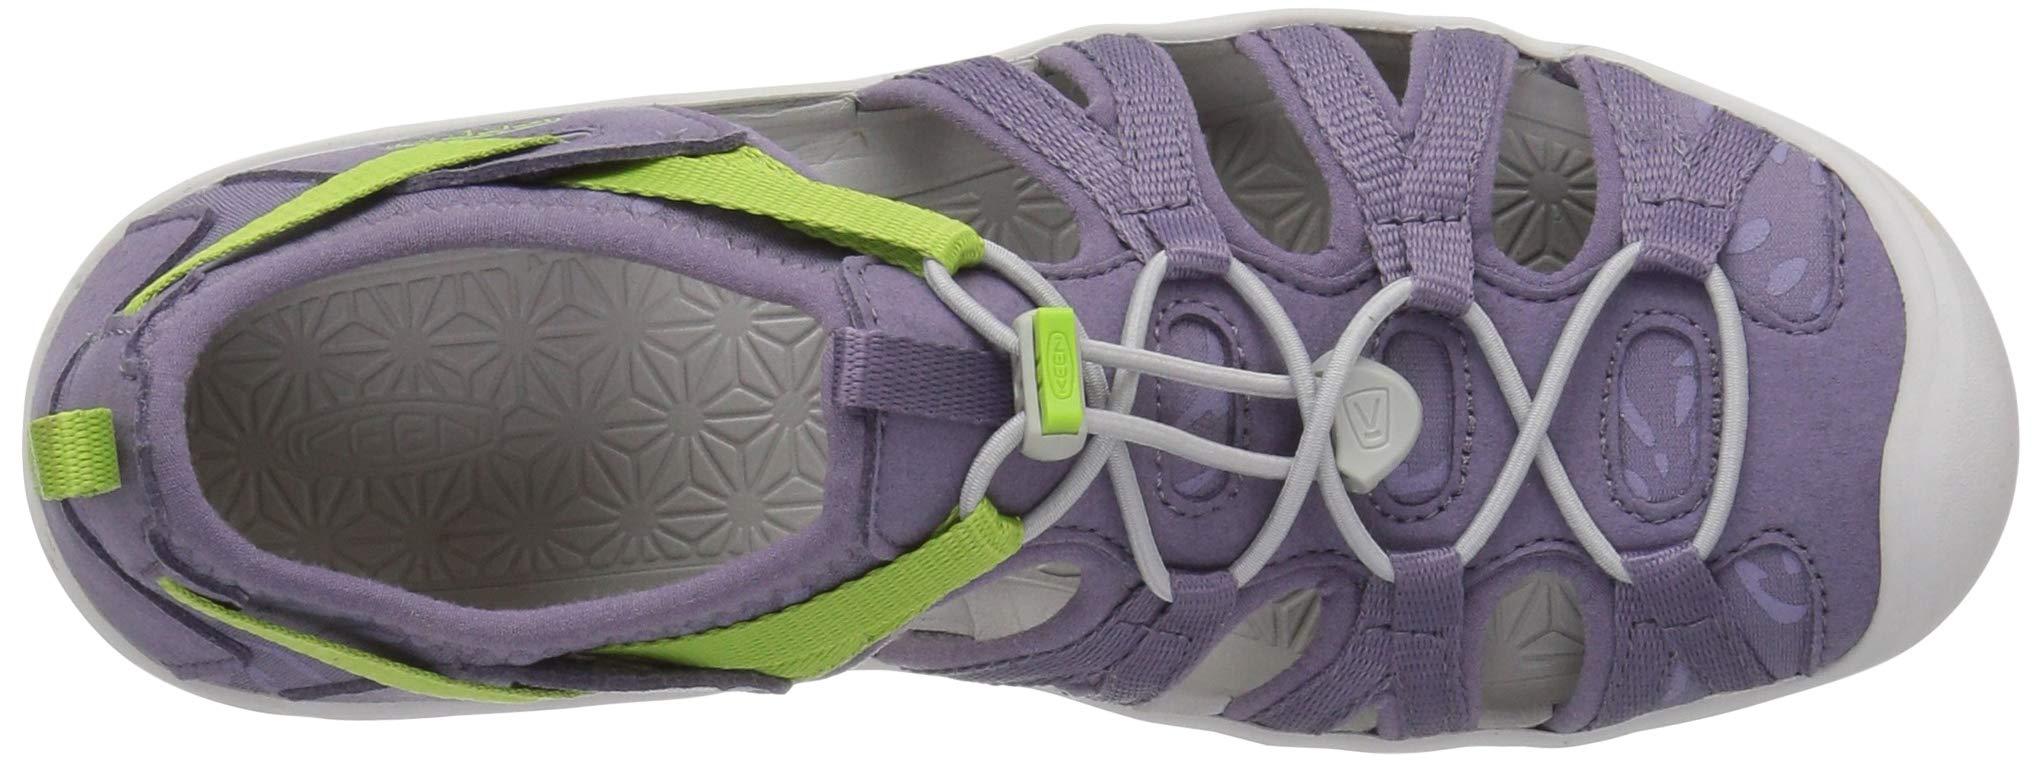 KEEN Unisex Moxie Sandal, Purple SAGE/Greenery, 6 M US Big Kid by KEEN (Image #8)